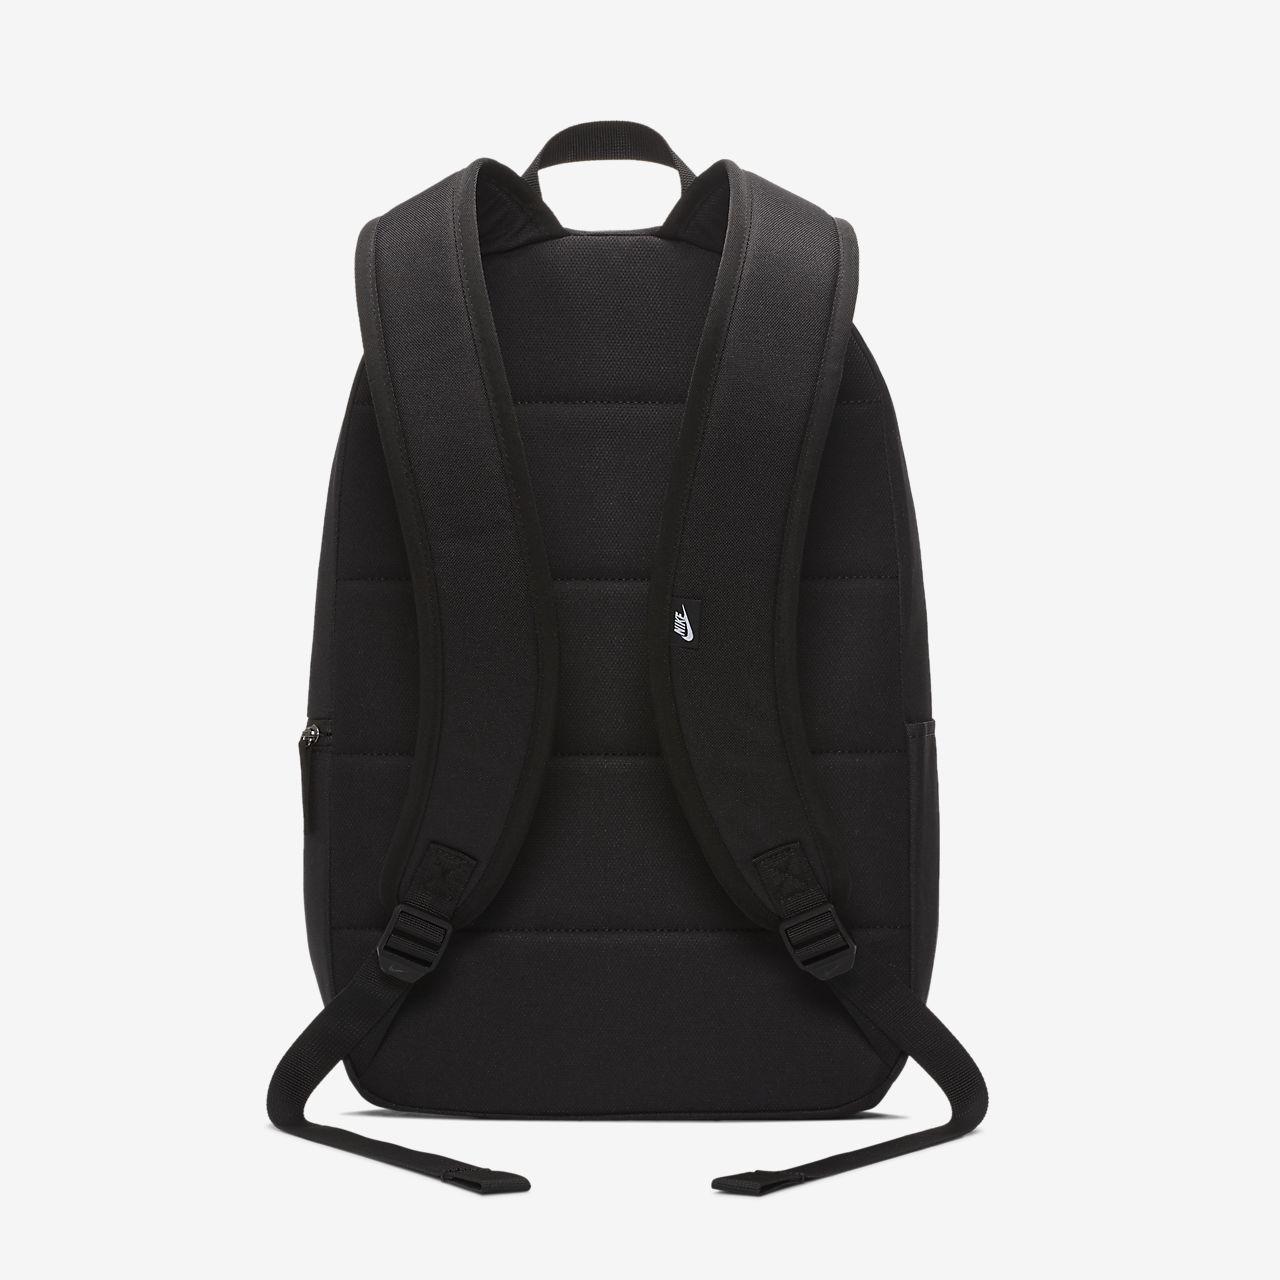 b54406a640 English Premier League Nike Football Backpack